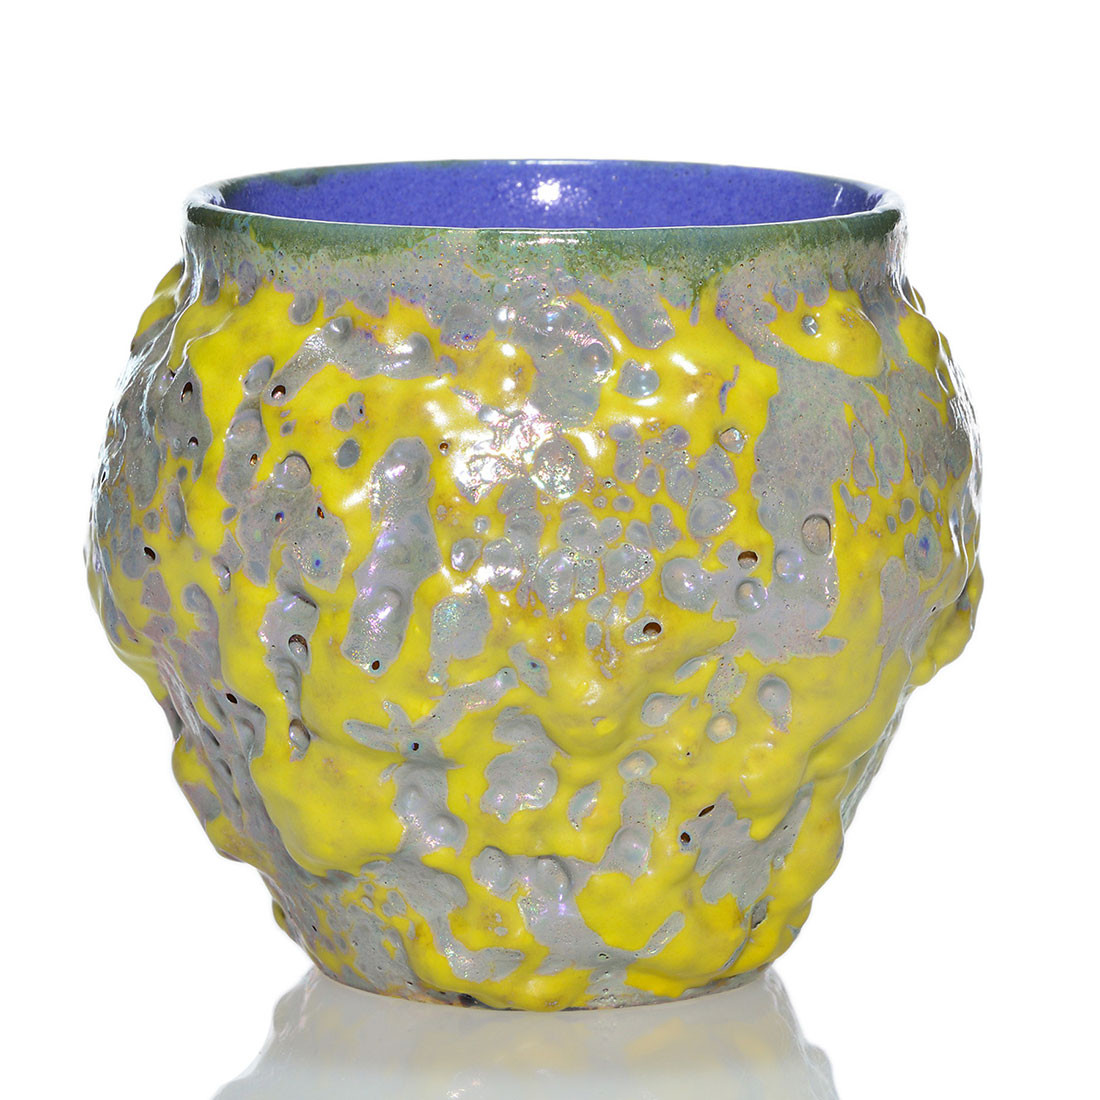 louwelsa weller vase of humler nolan items for sale with regard to 0394 paul katrich volcanic vase 3 1 8 piece 450 read more